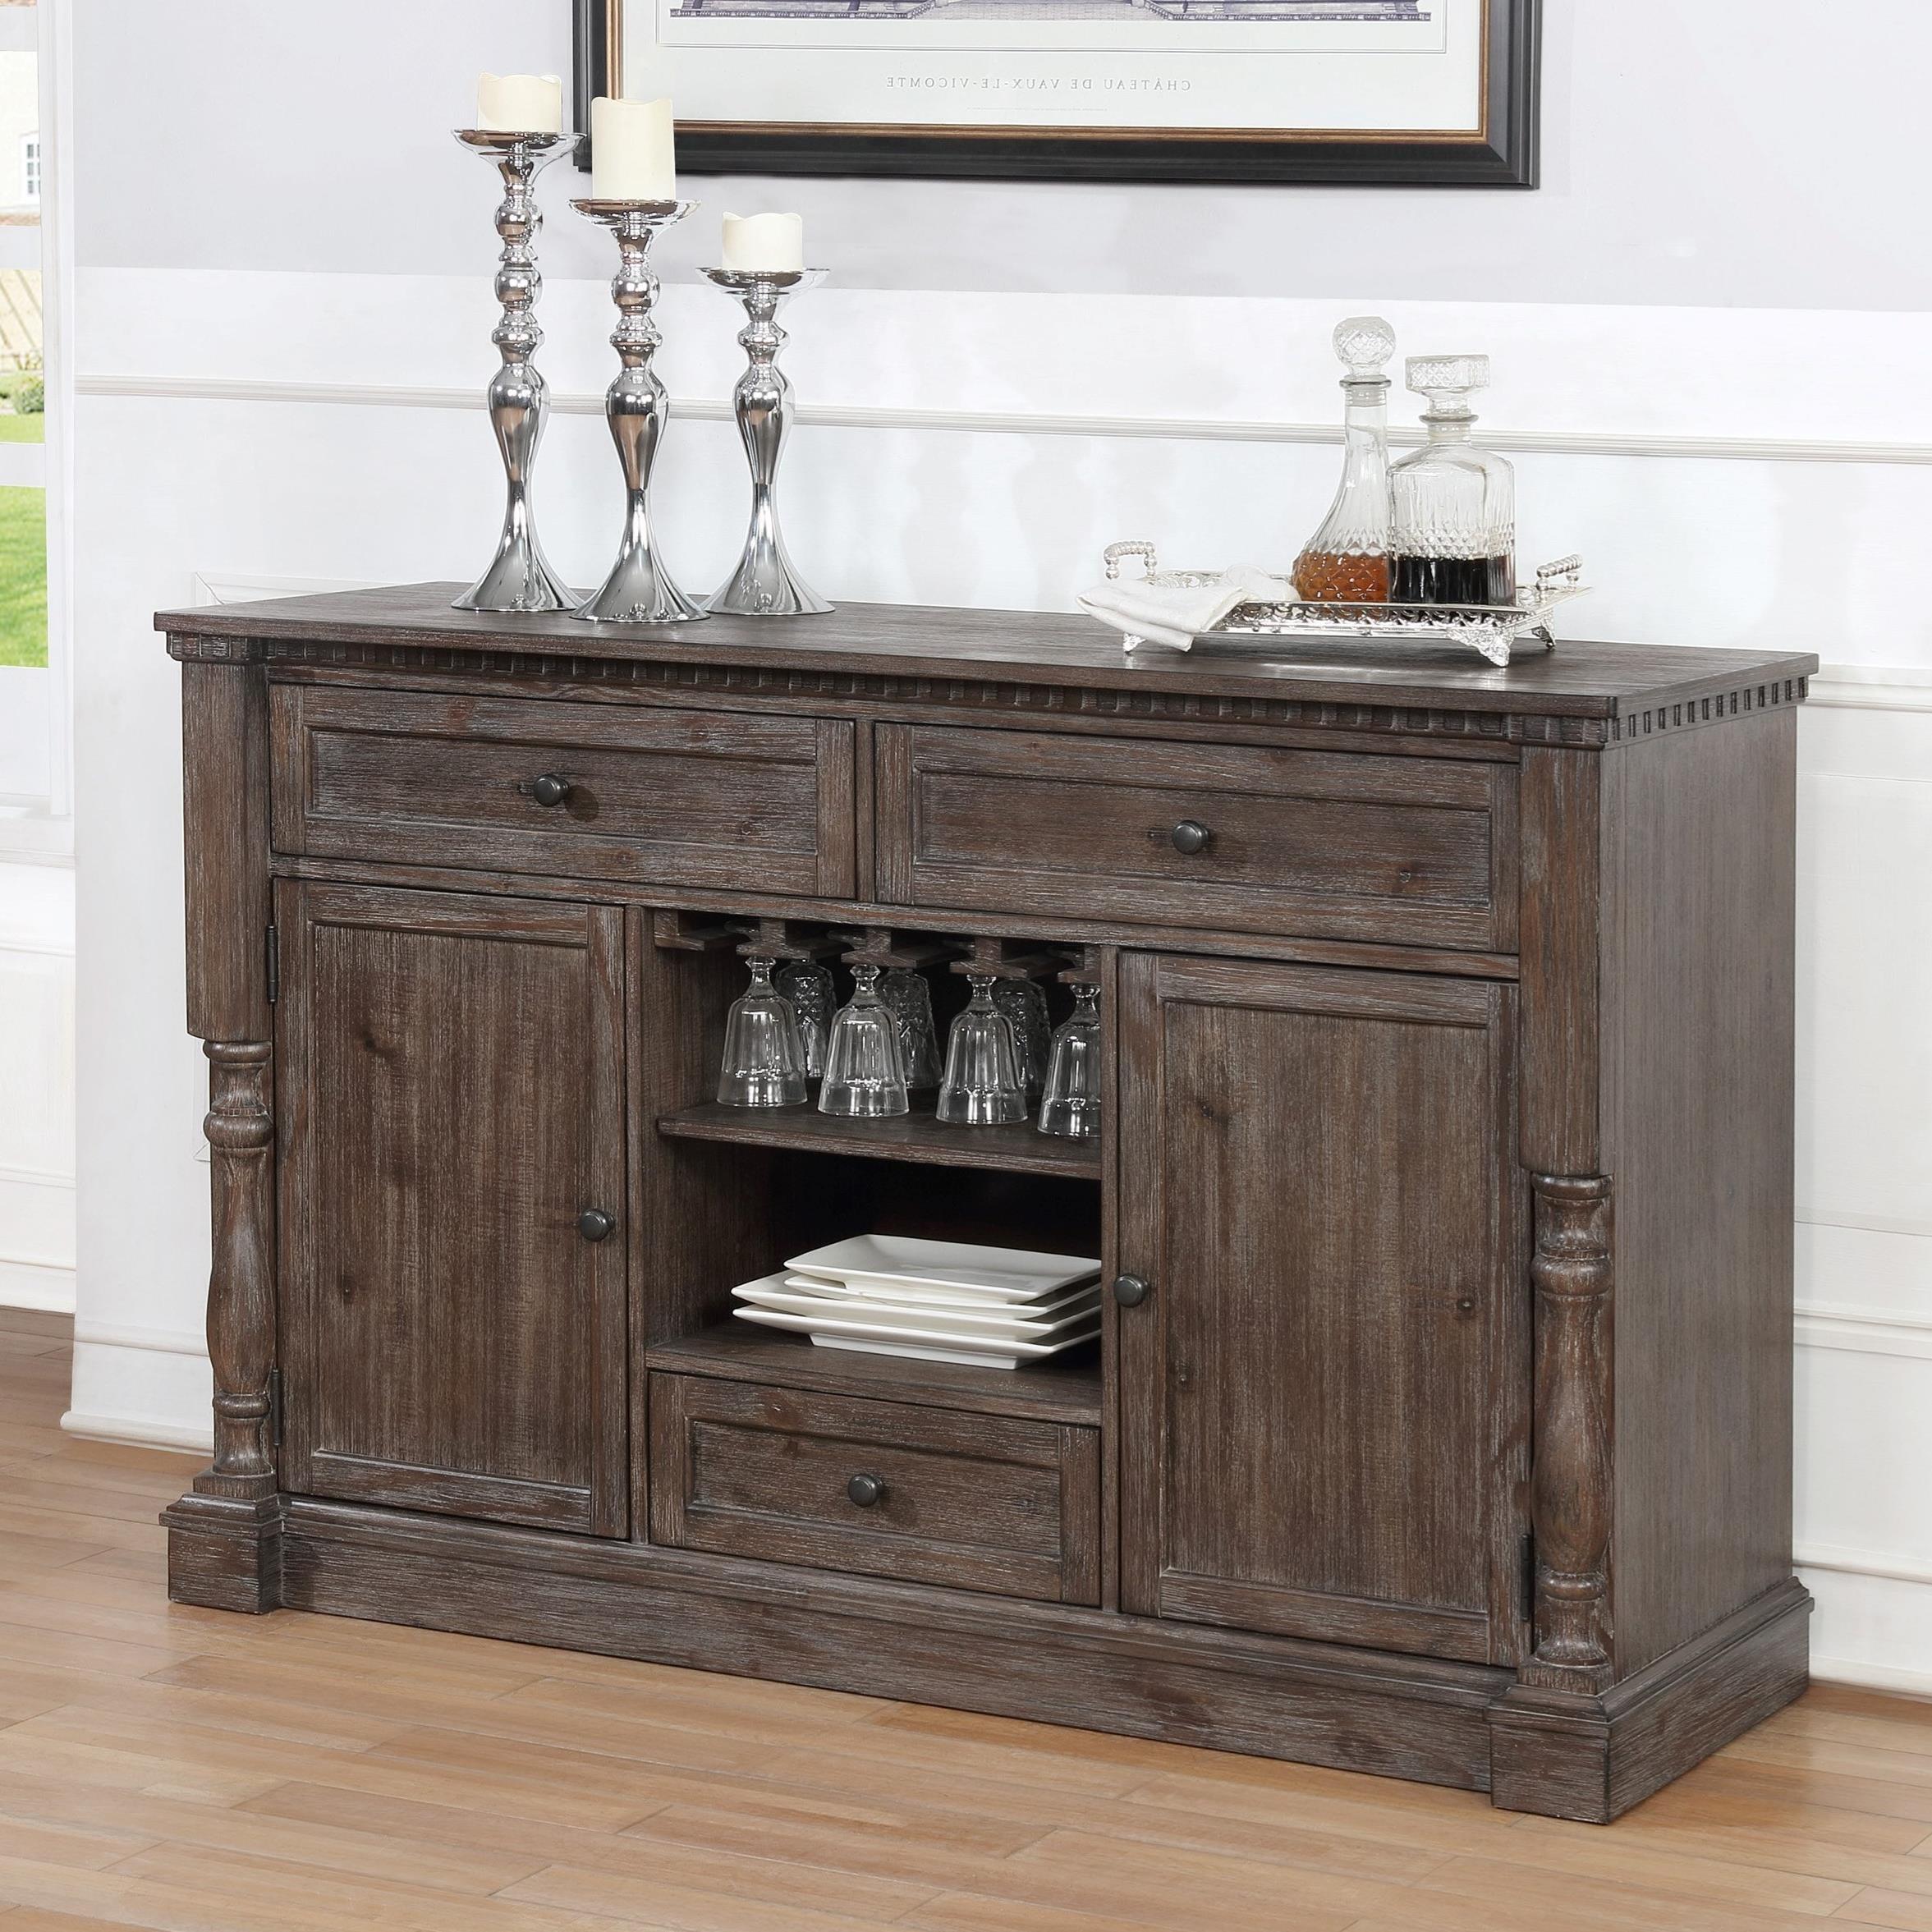 Crown Mark Regent 2270 SERVER Transitional Dining Room Server With Wine  Glass Storage | Household Furniture | Servers